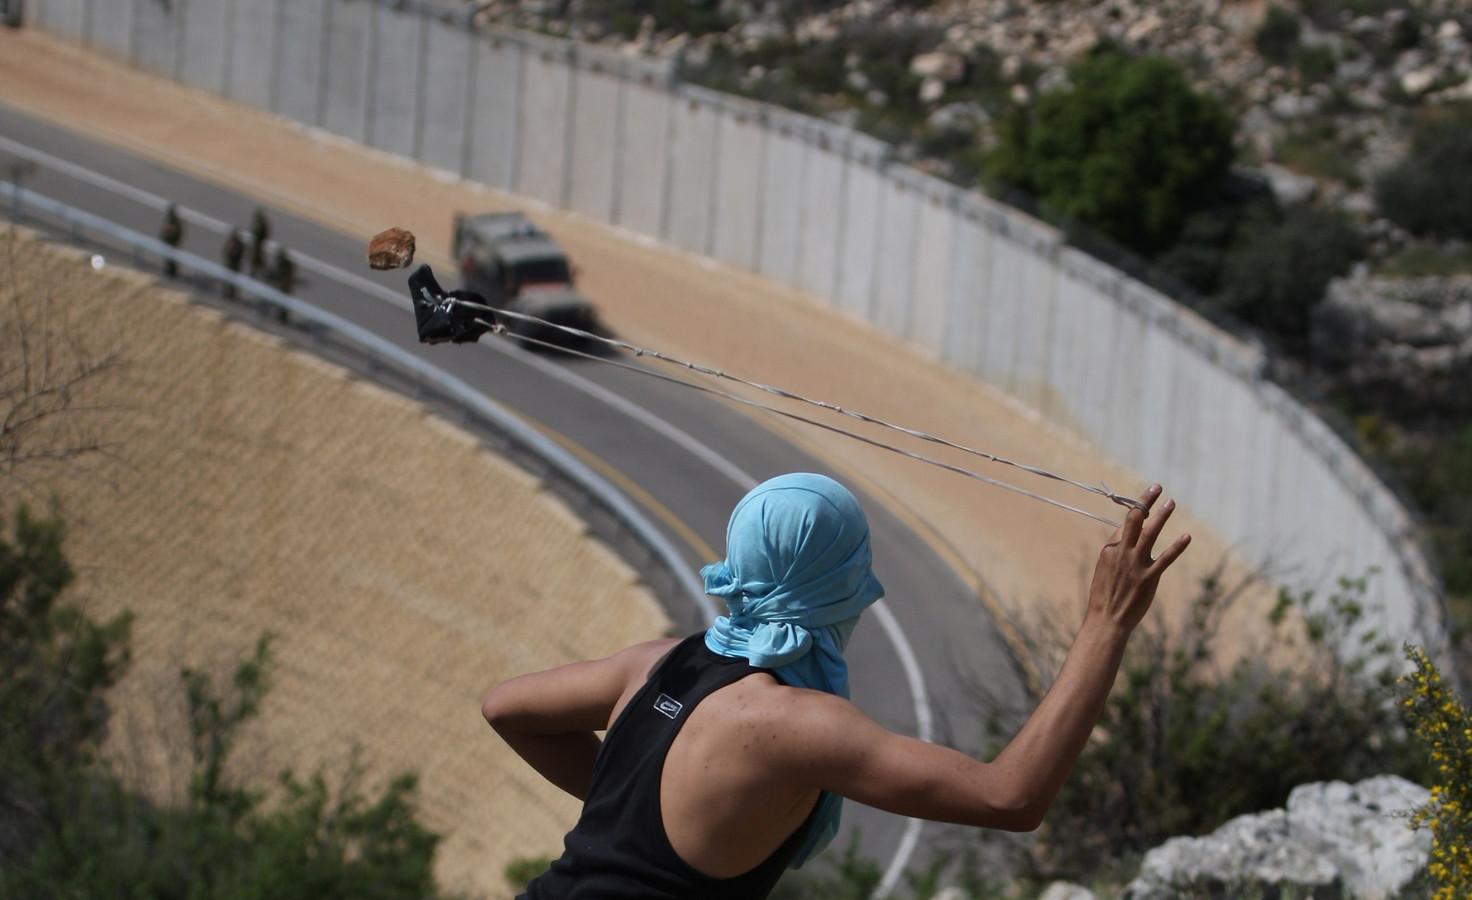 De Israëlische afscheidingsmuur bij Ramallah.